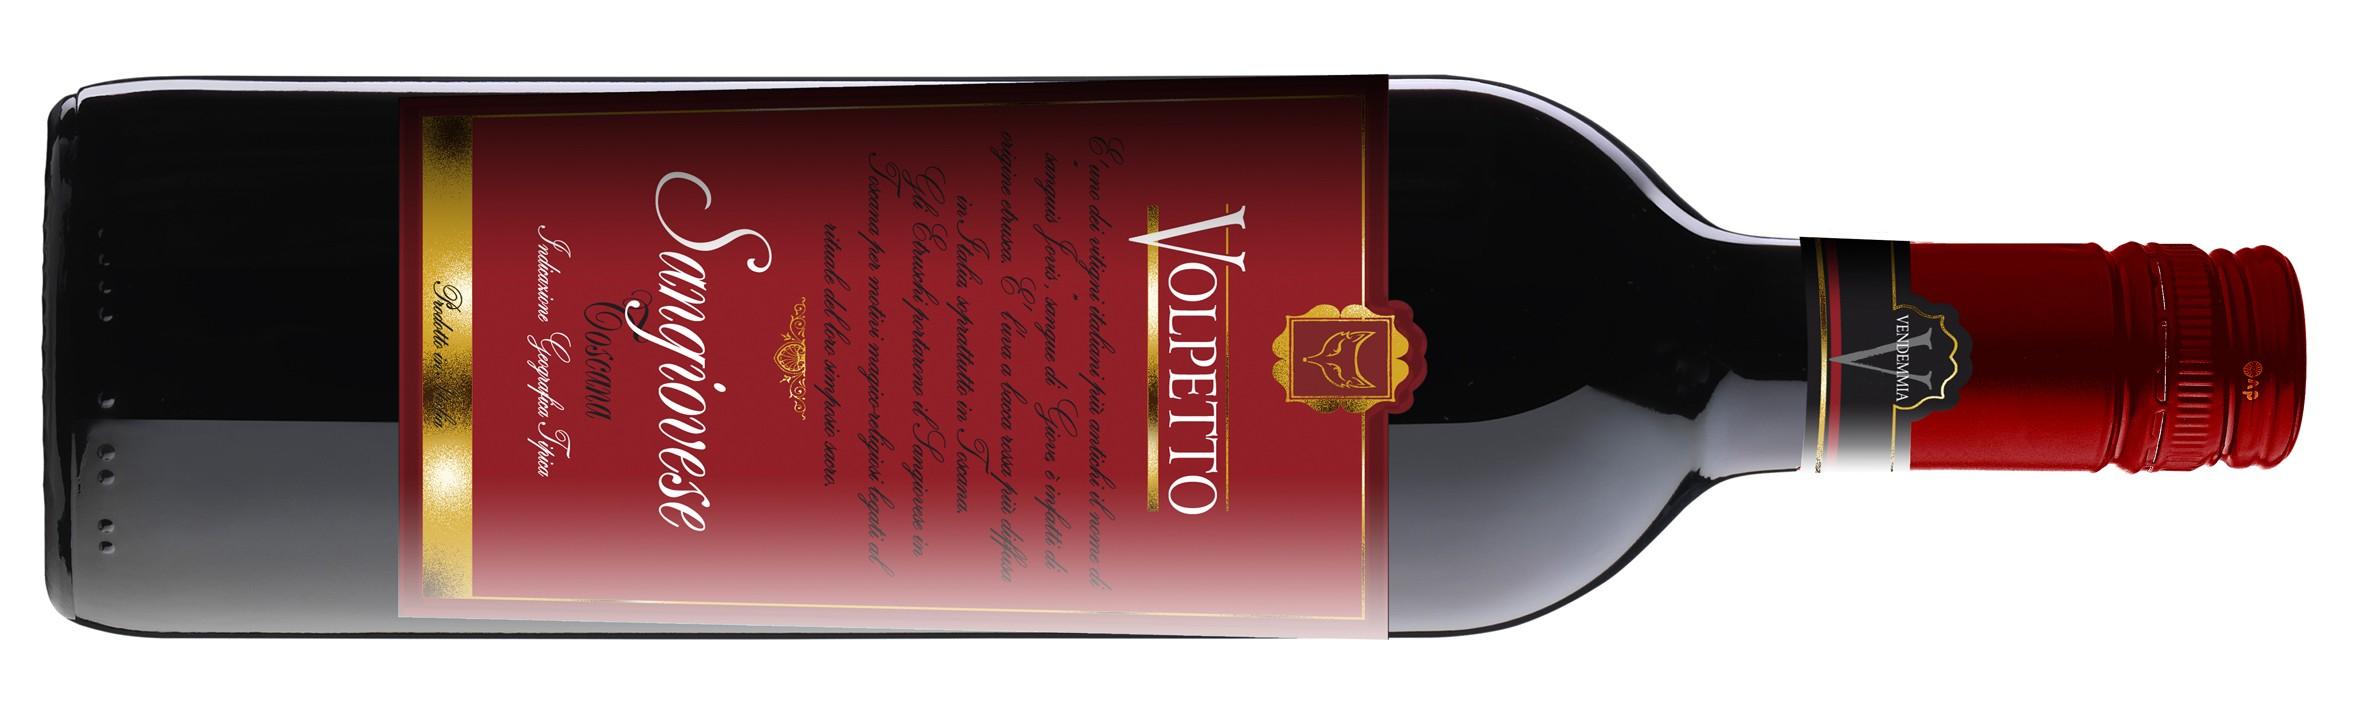 009 Volpetto Sangiovese bottle shot